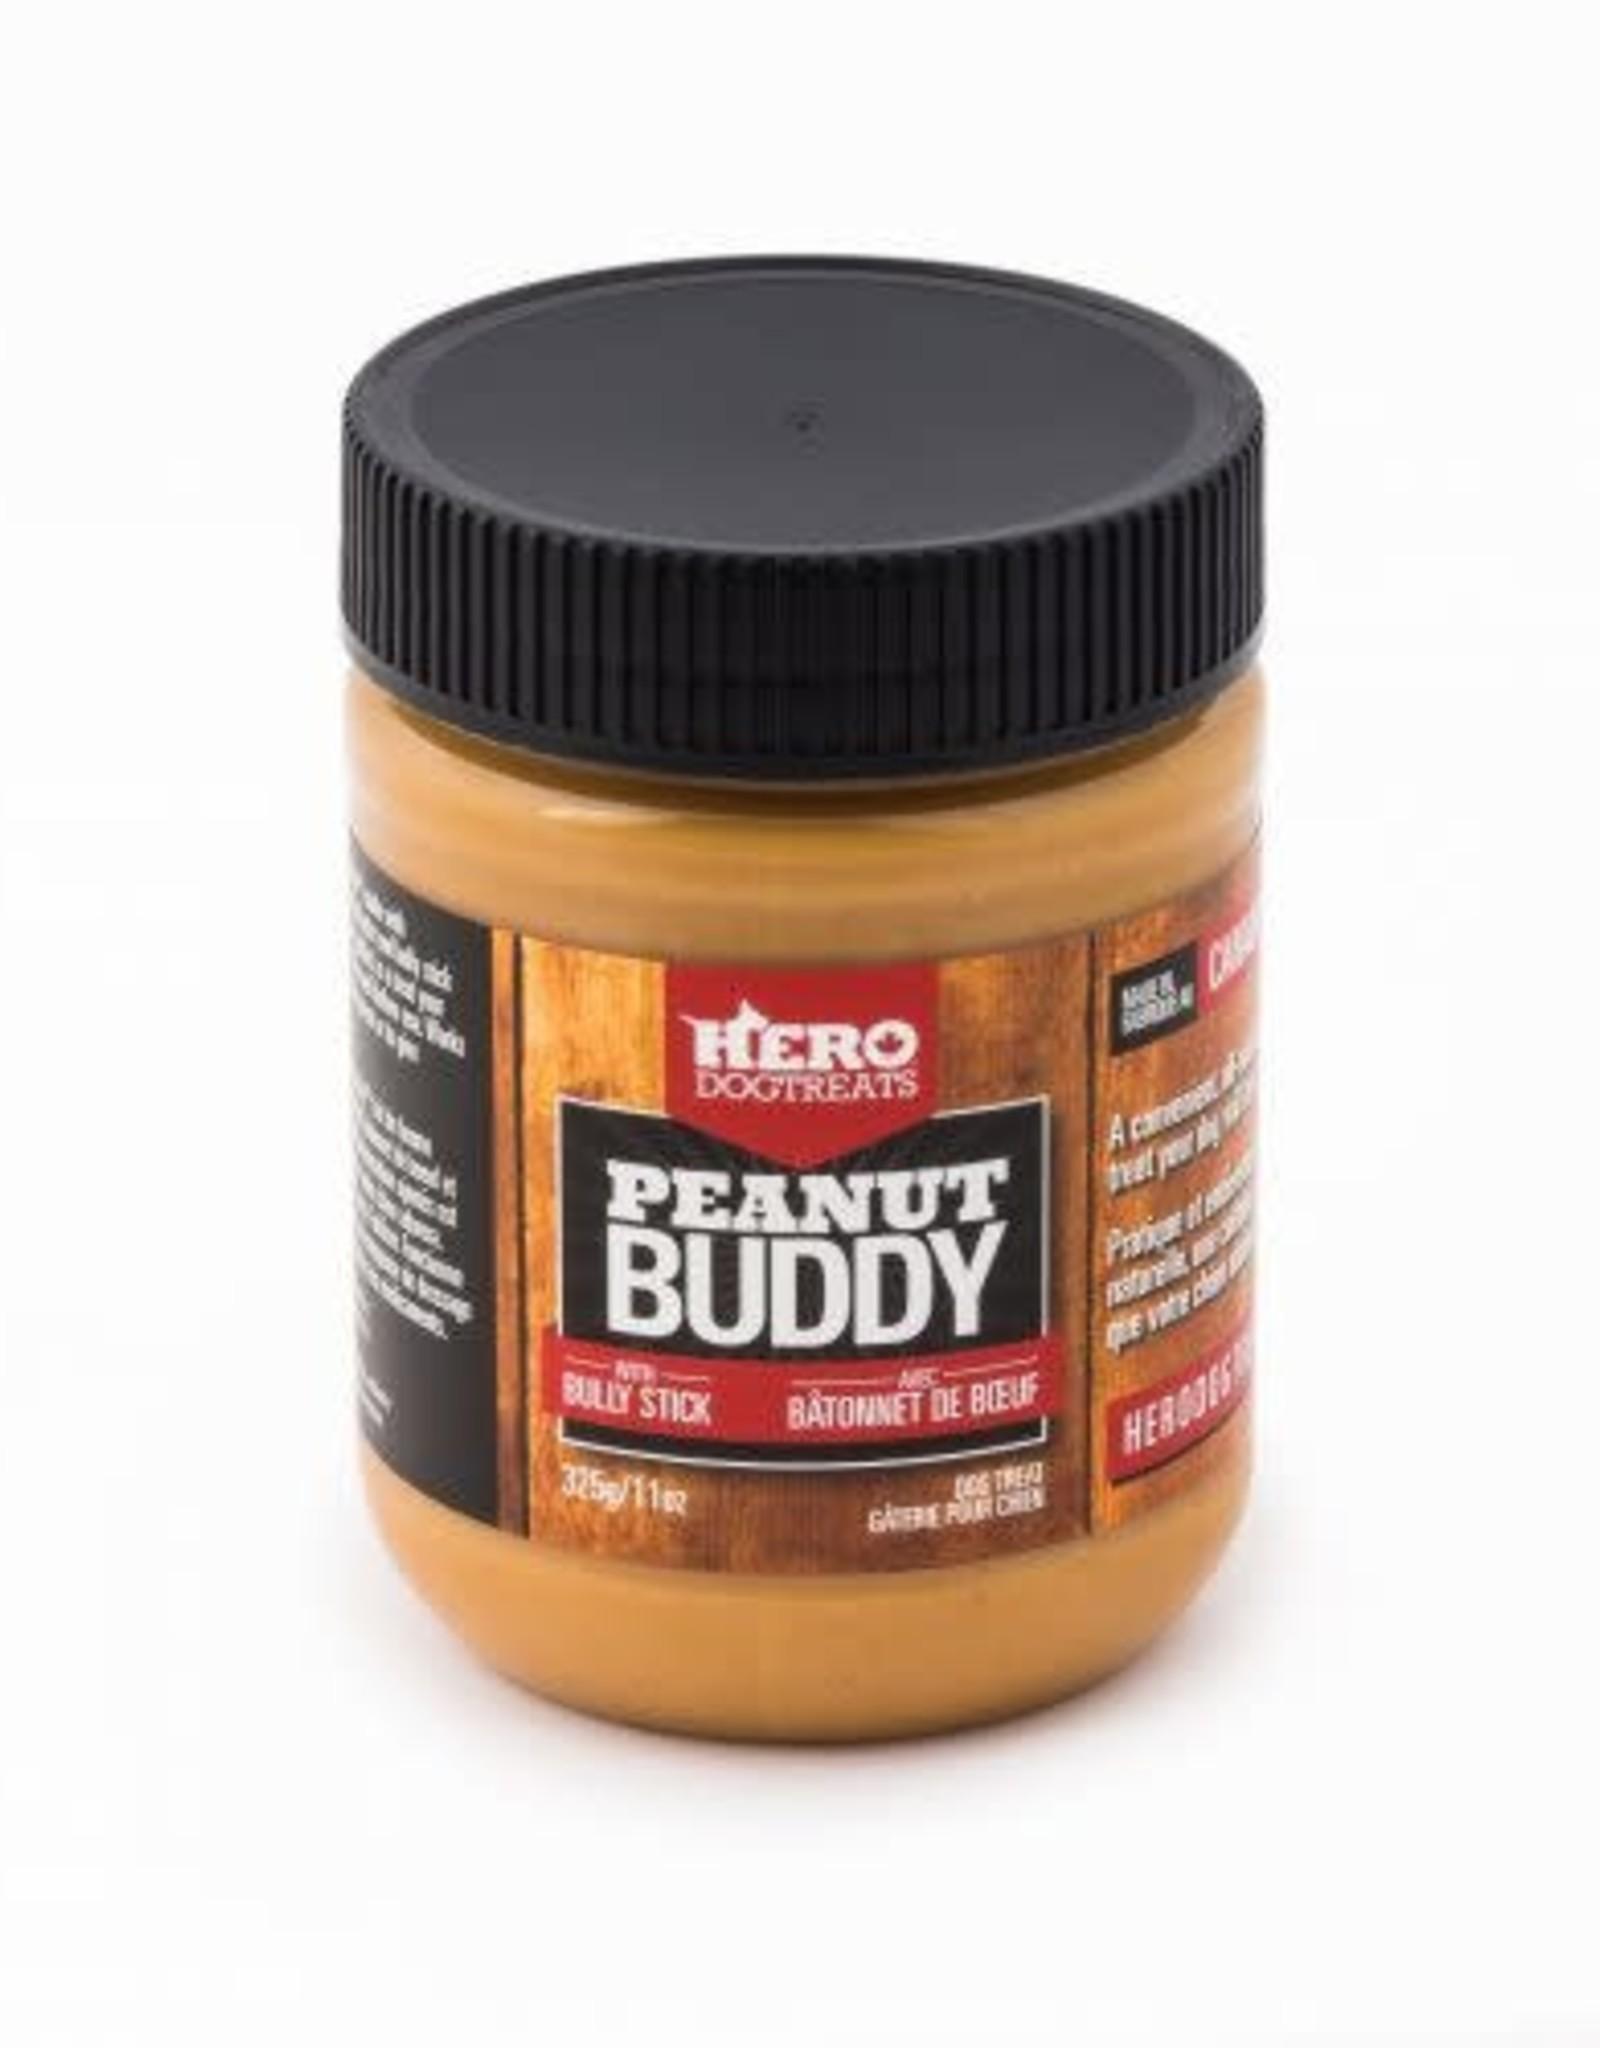 Big Country Raw Peanut Buddy Bully Stick 325 g